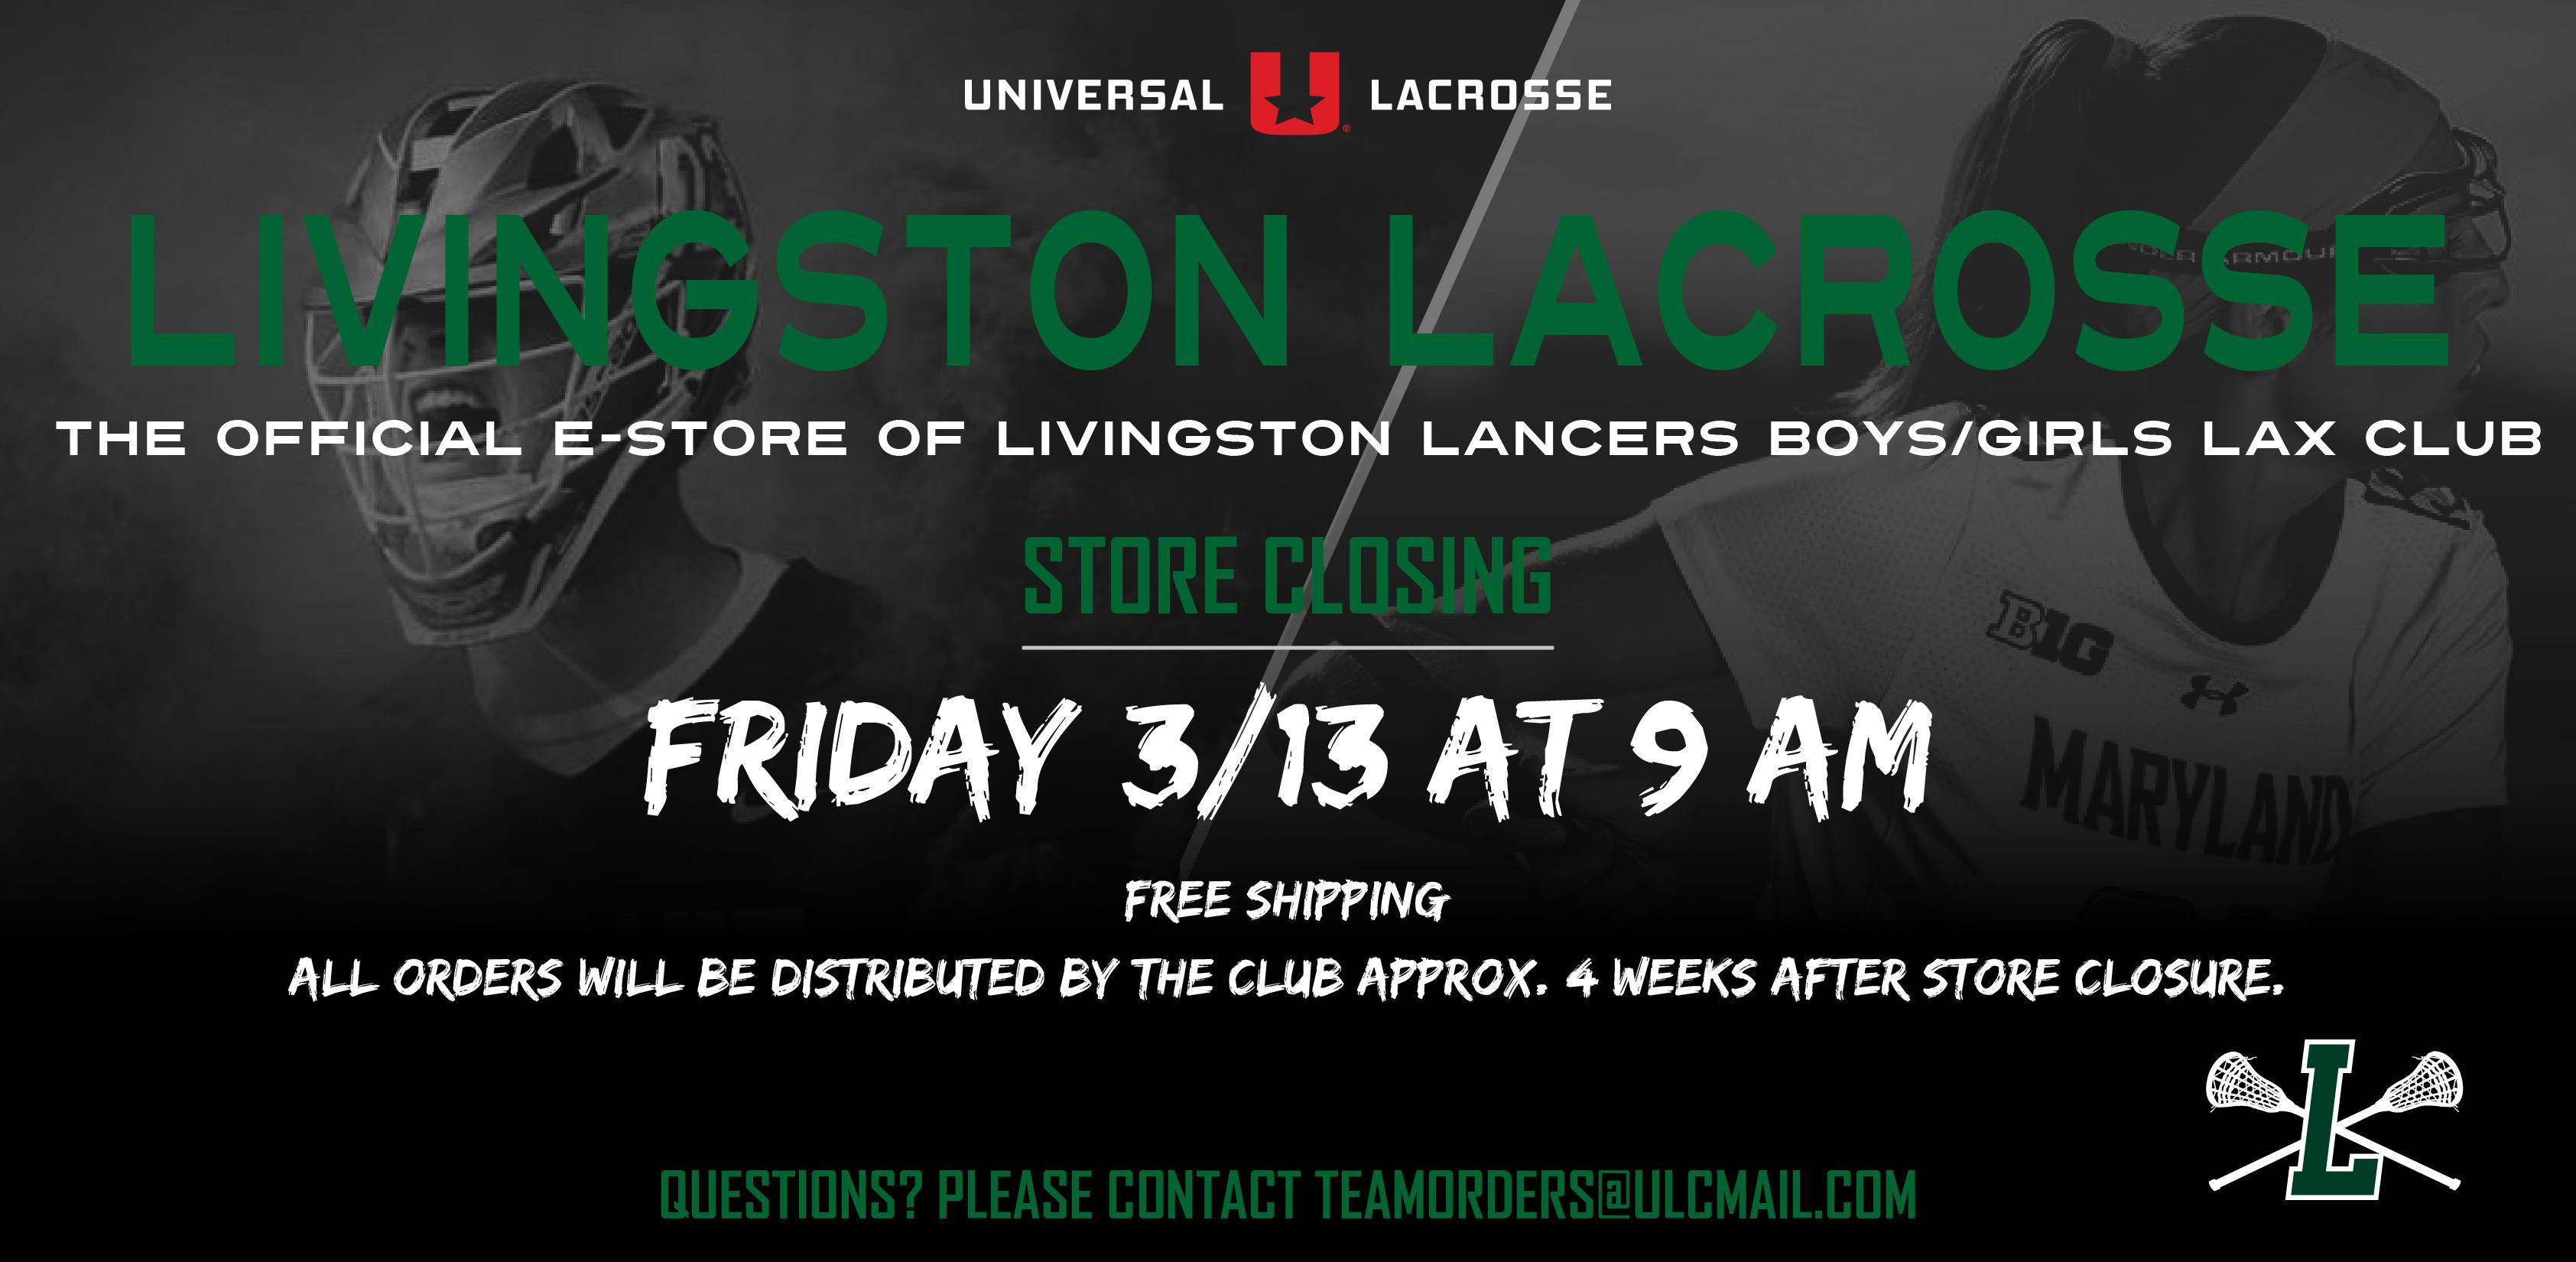 Livingston Lancers Lacrosse Club